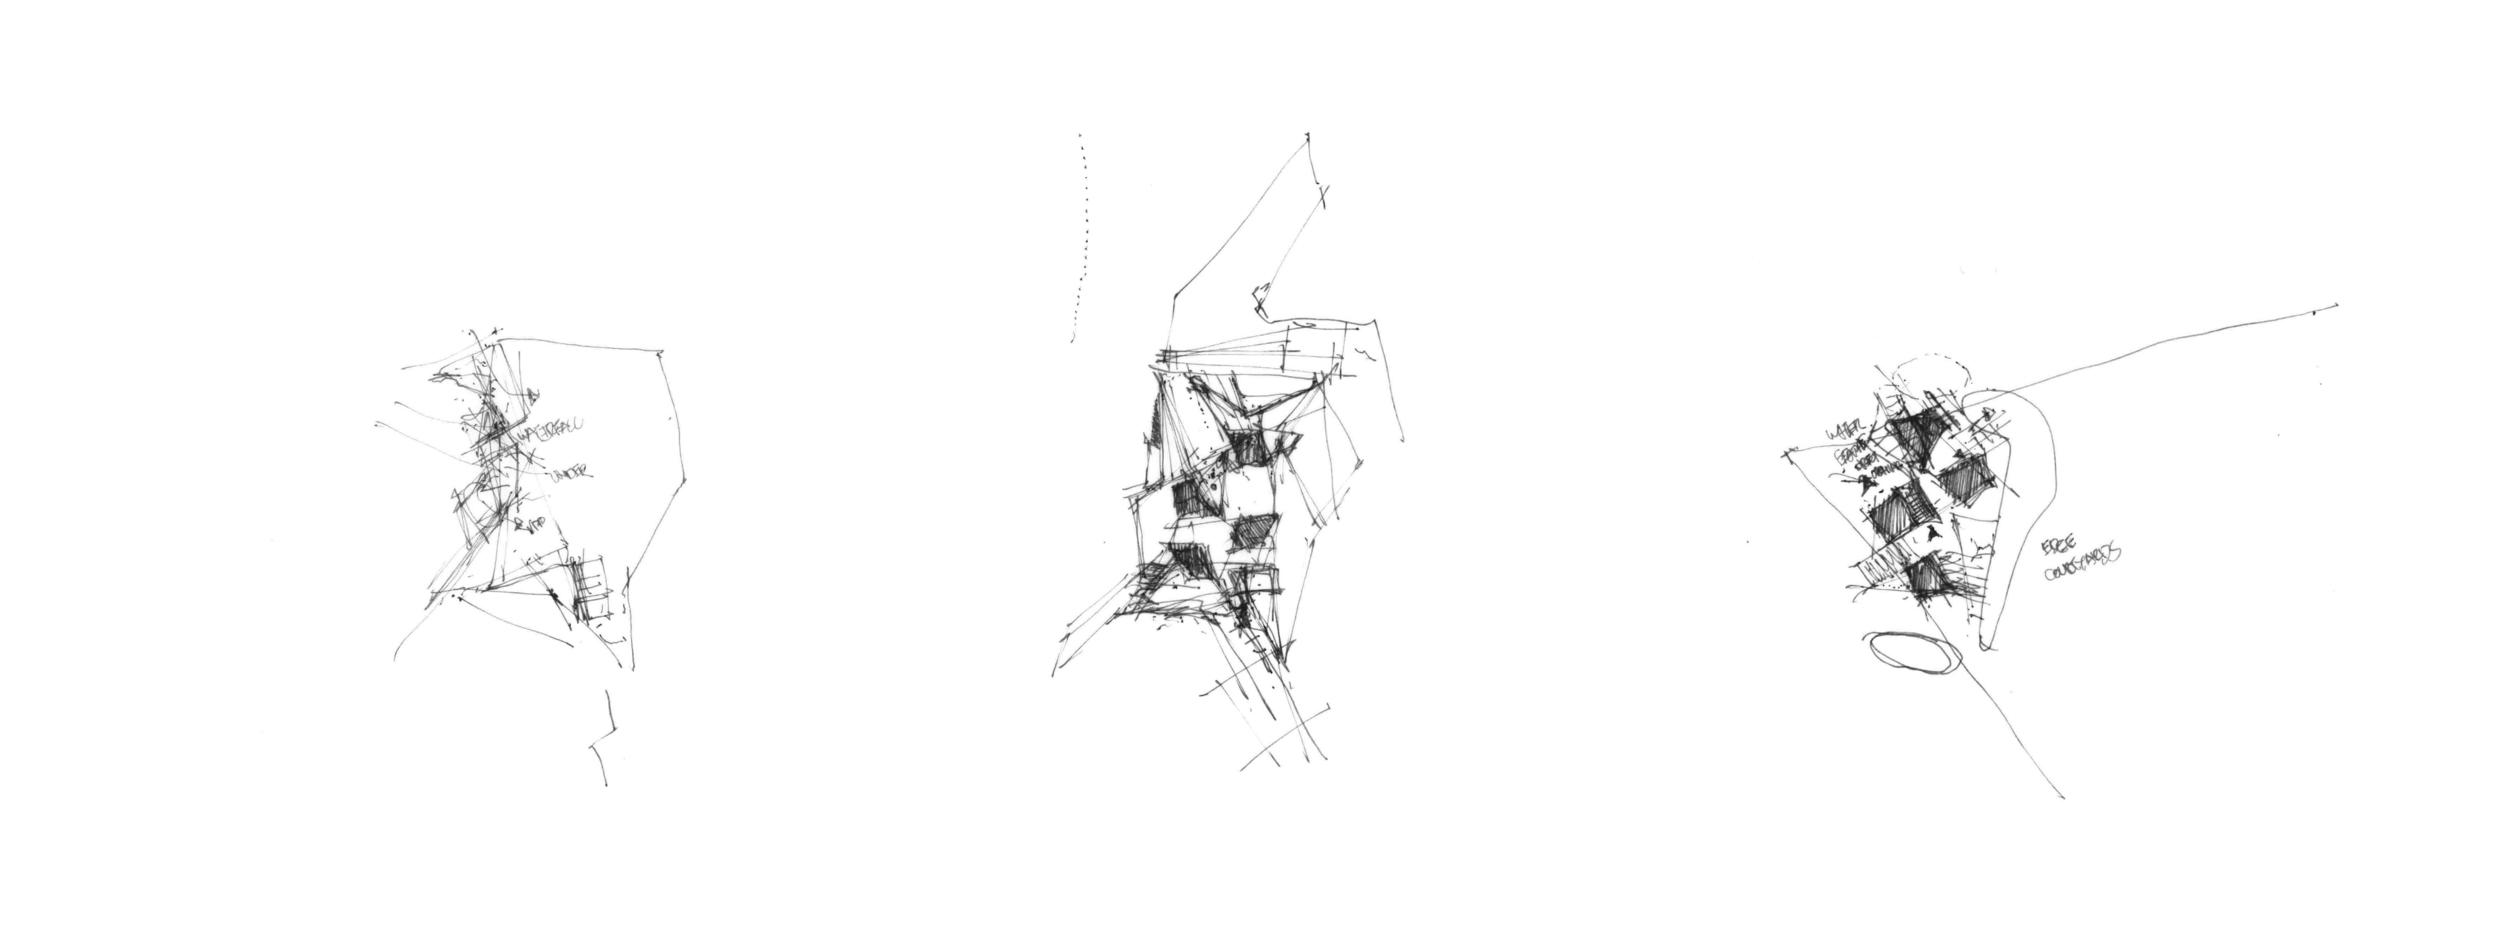 CIDB_Redevlopment Concept Proposal_Final_Page_02_!.jpg